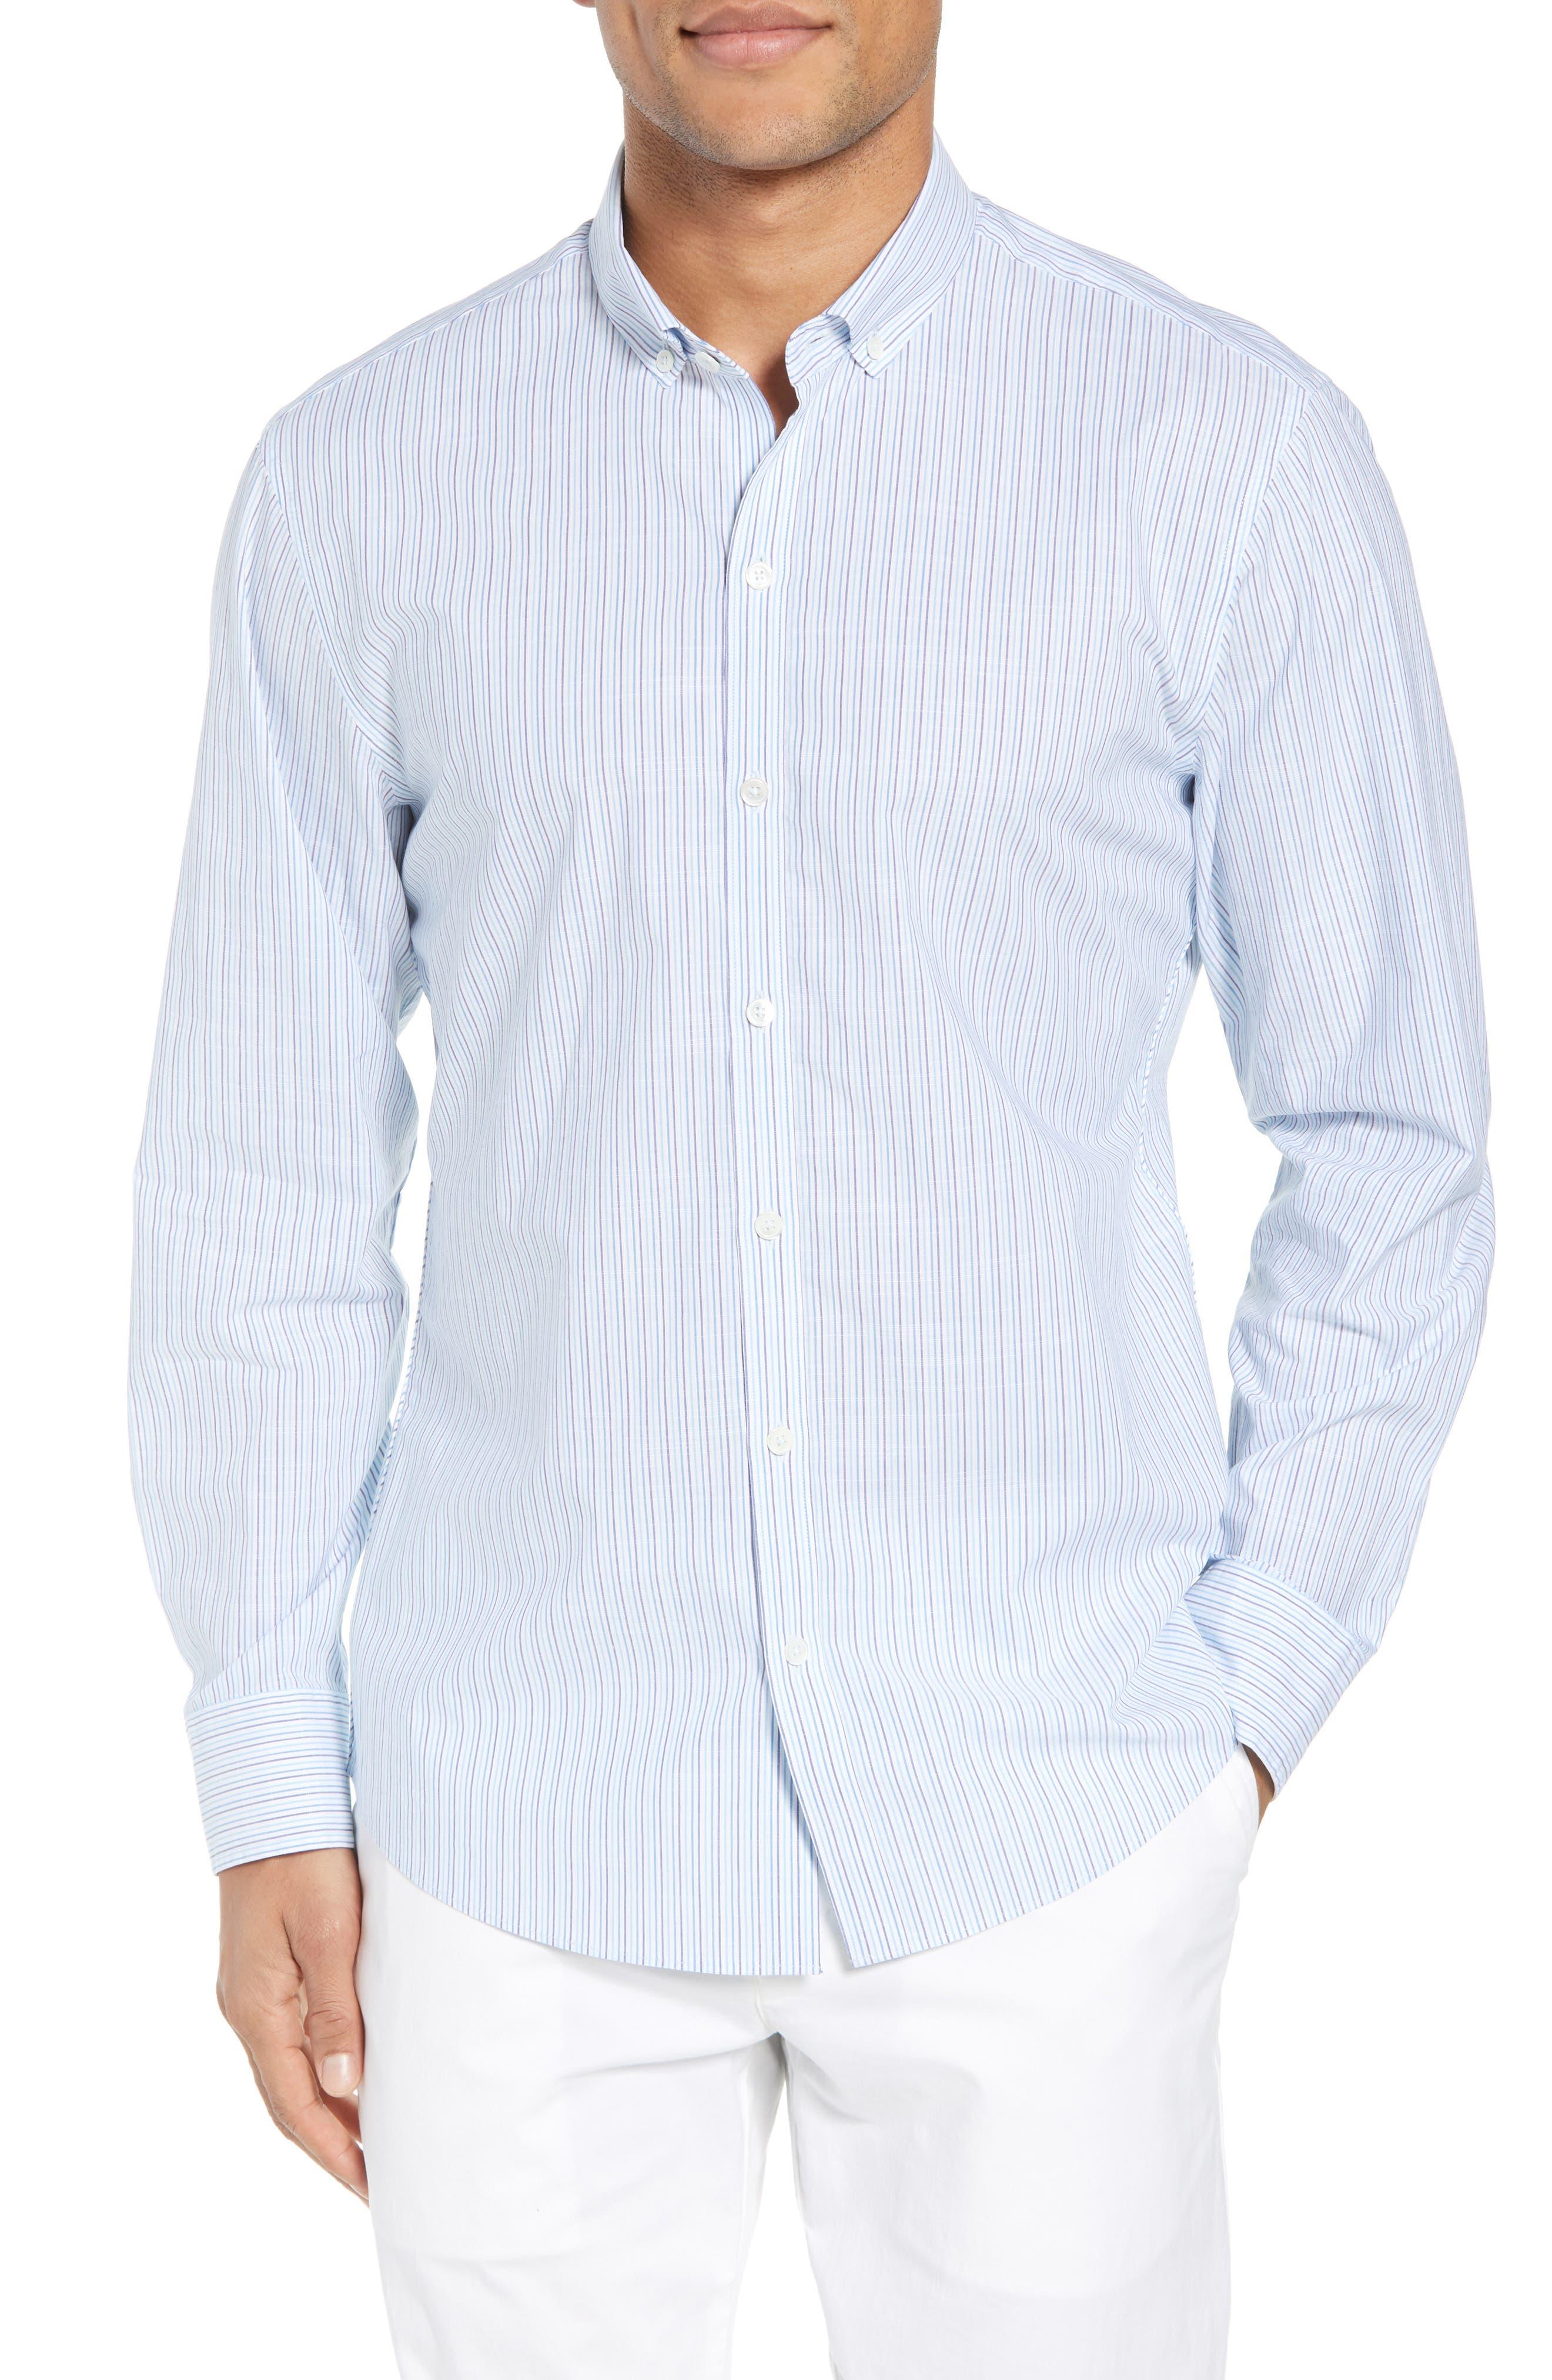 Skeeter Stripe Sport Shirt,                         Main,                         color, 440